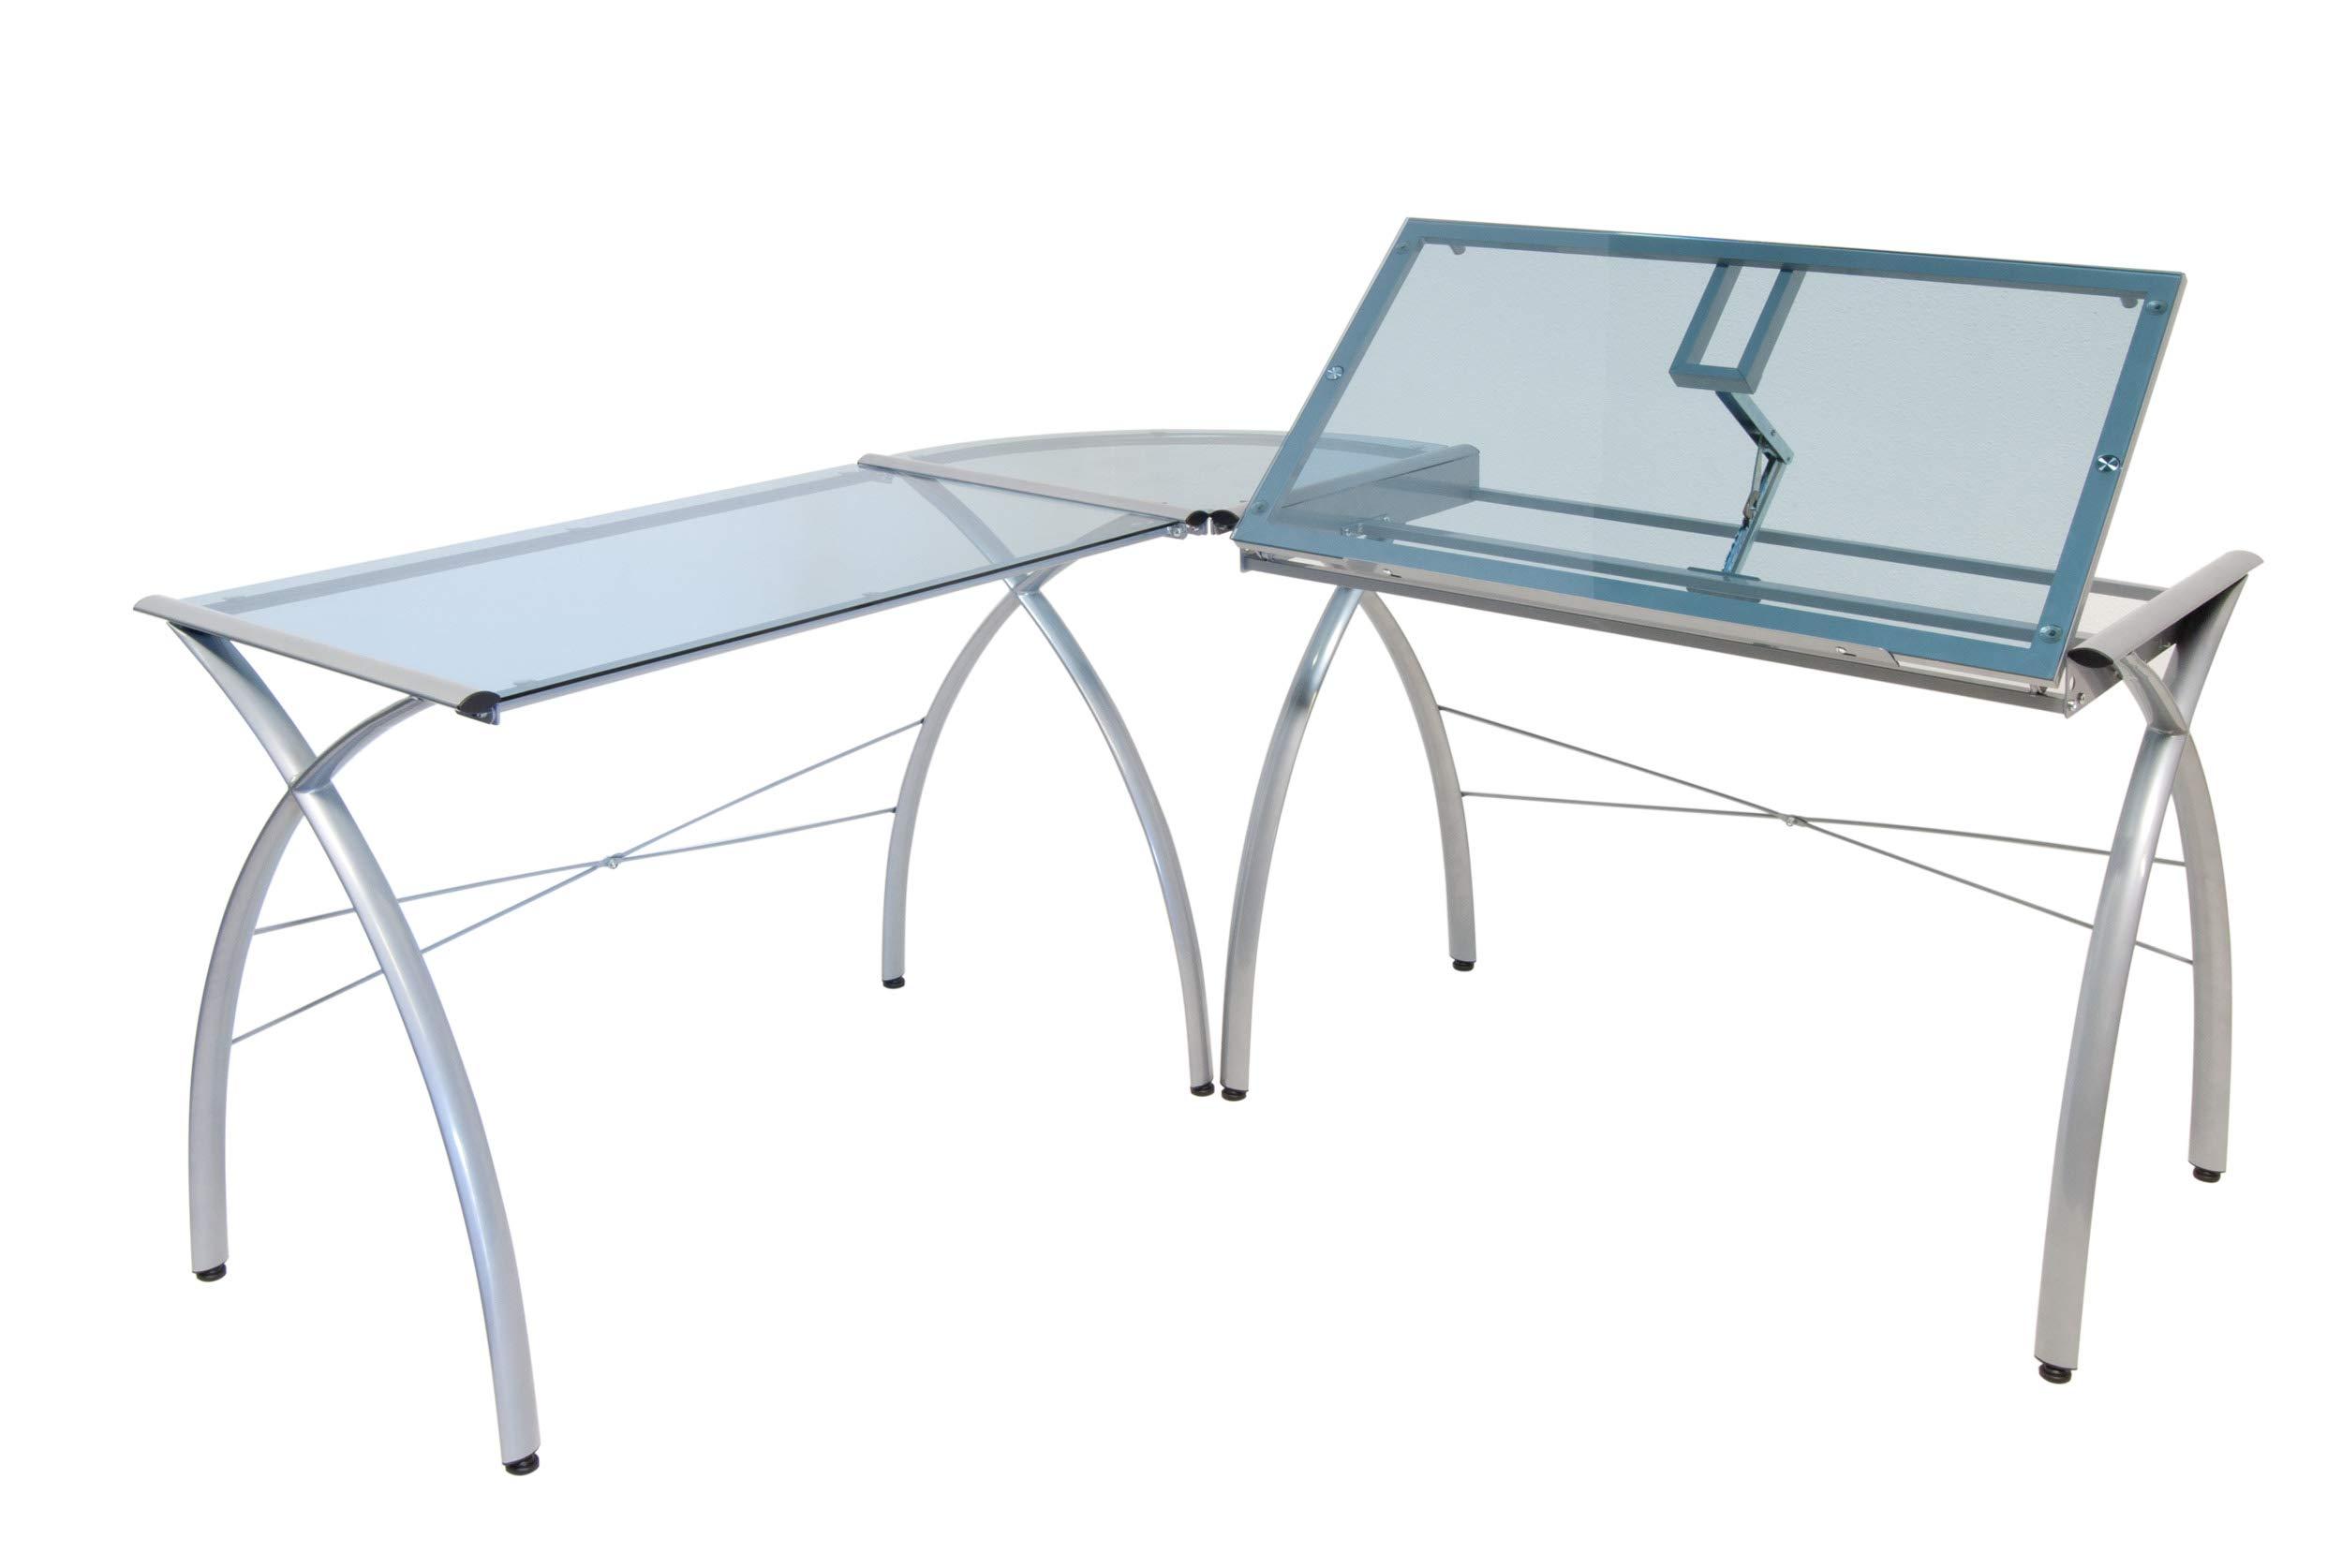 Studio Designs 50306 Futura LS Work Center with Tilt, Silver/Blue Glass